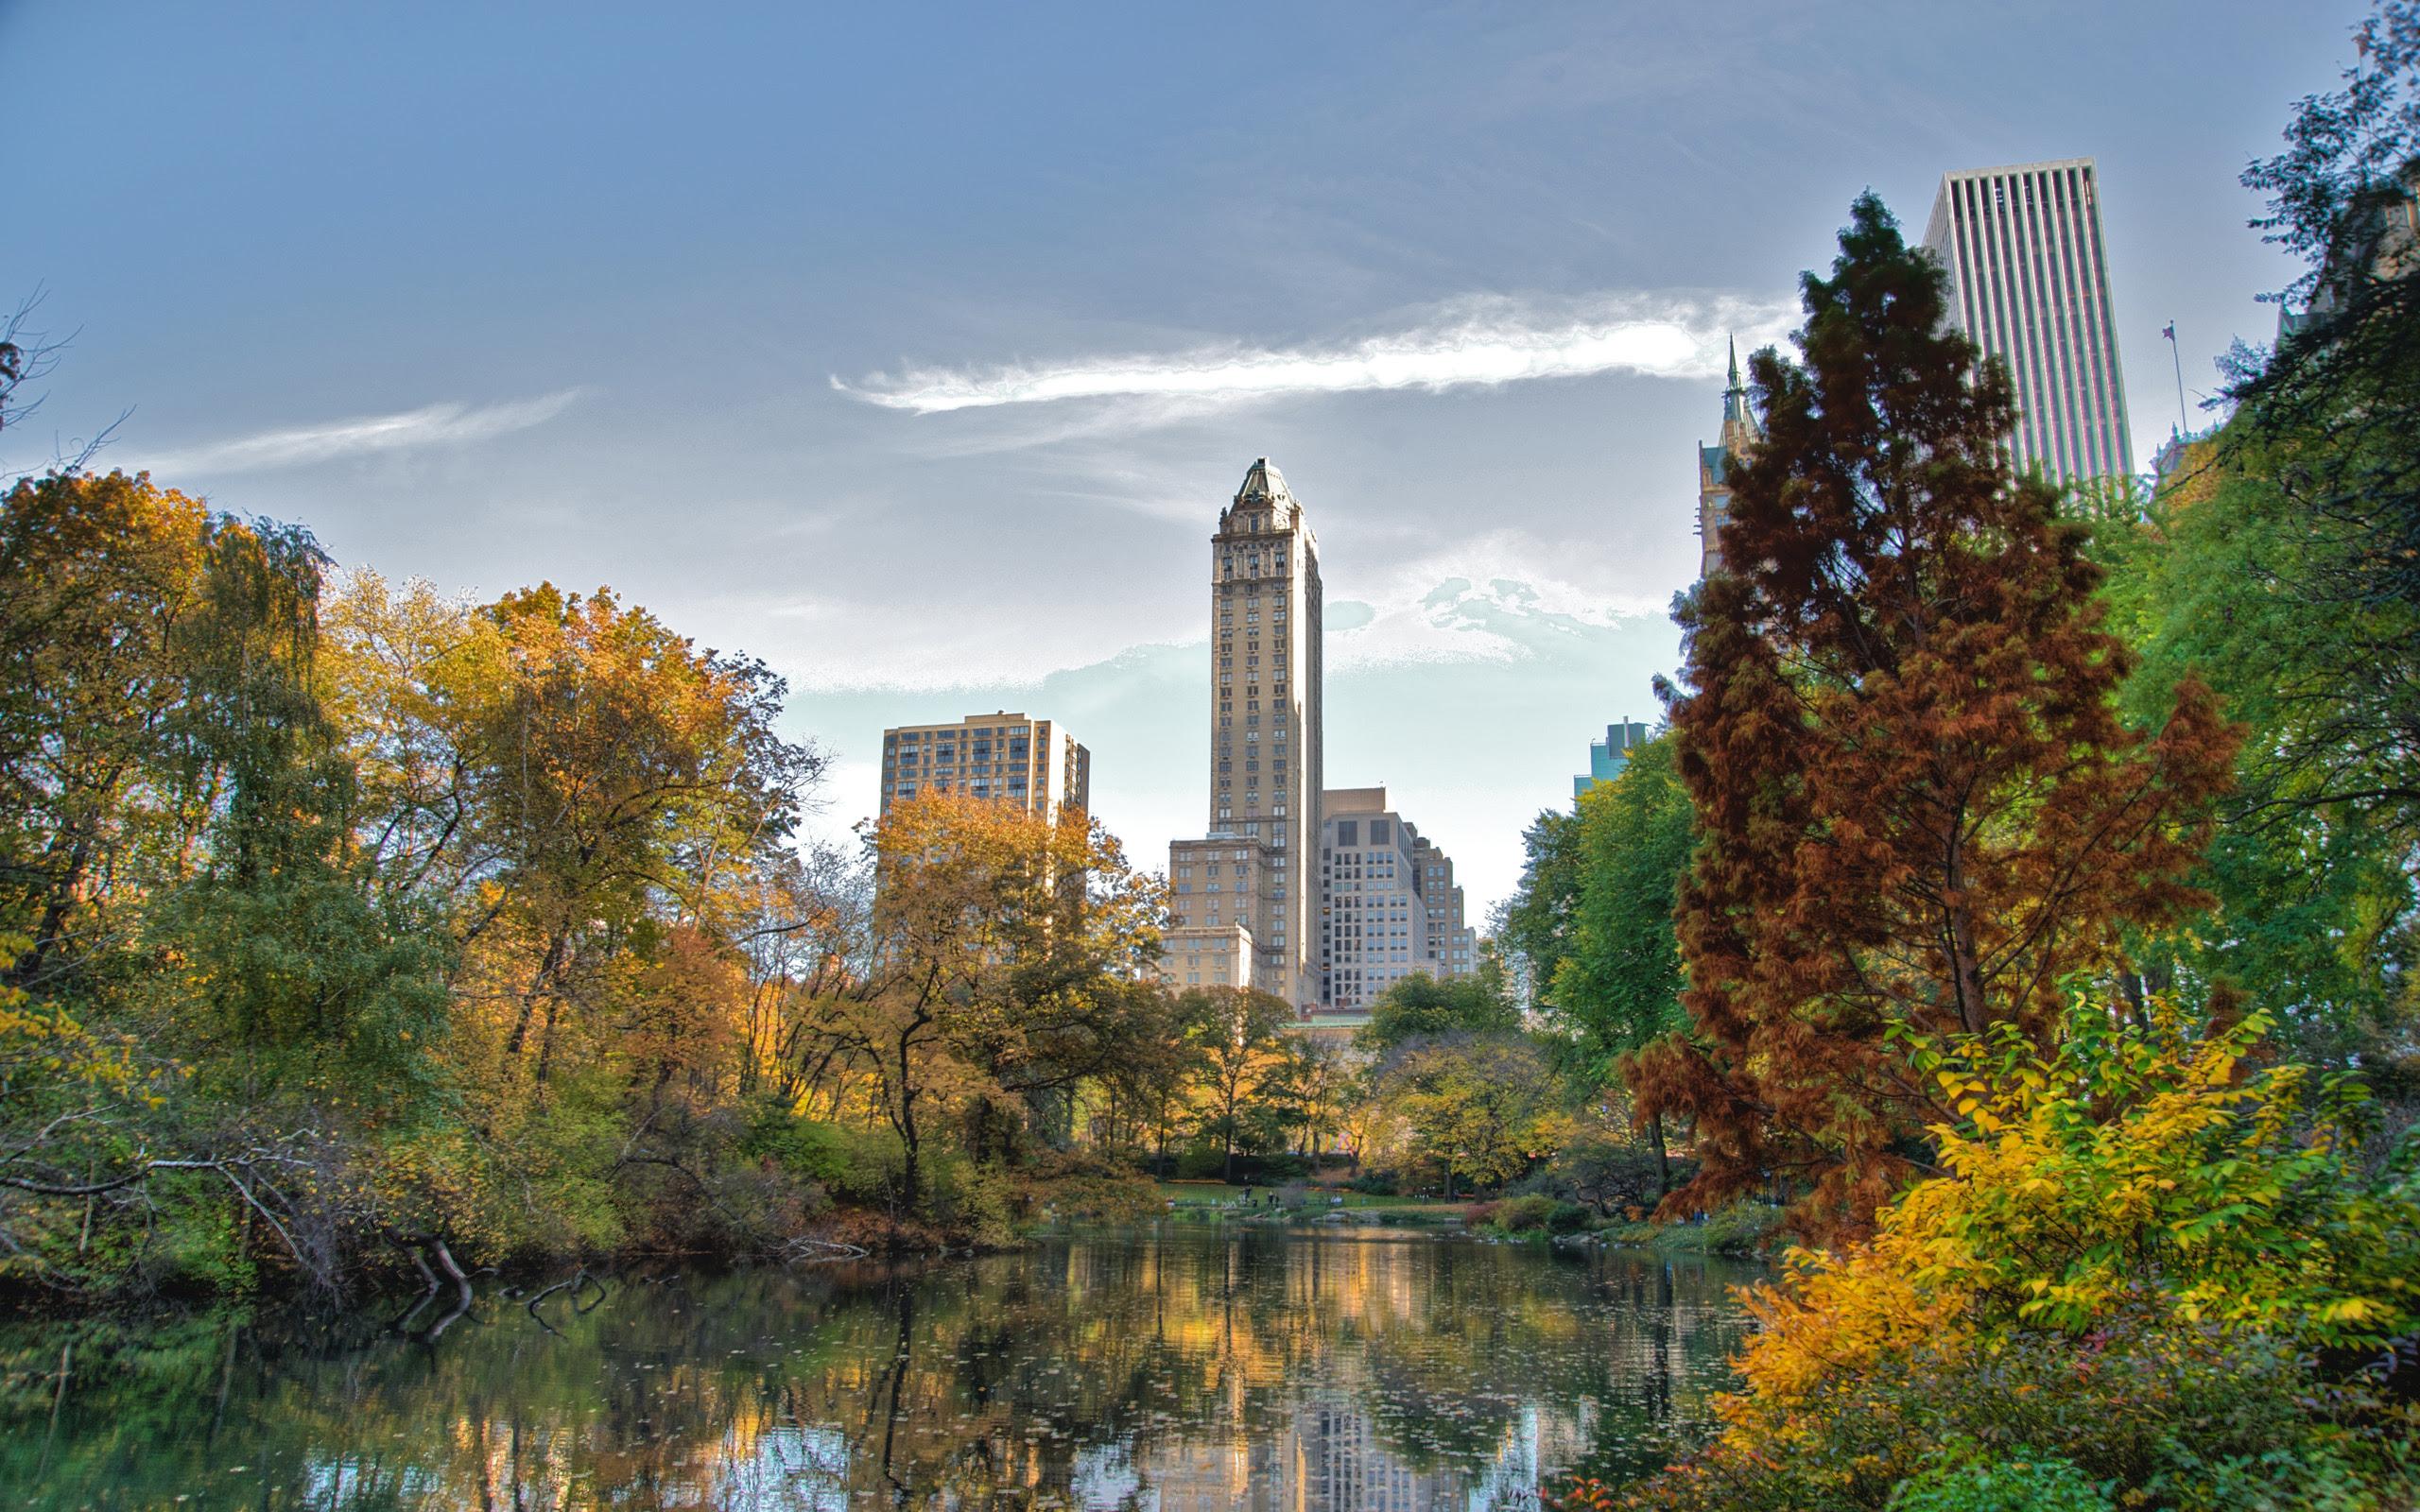 16 Excellent HD Central Park Wallpapers - HDWallSource.com